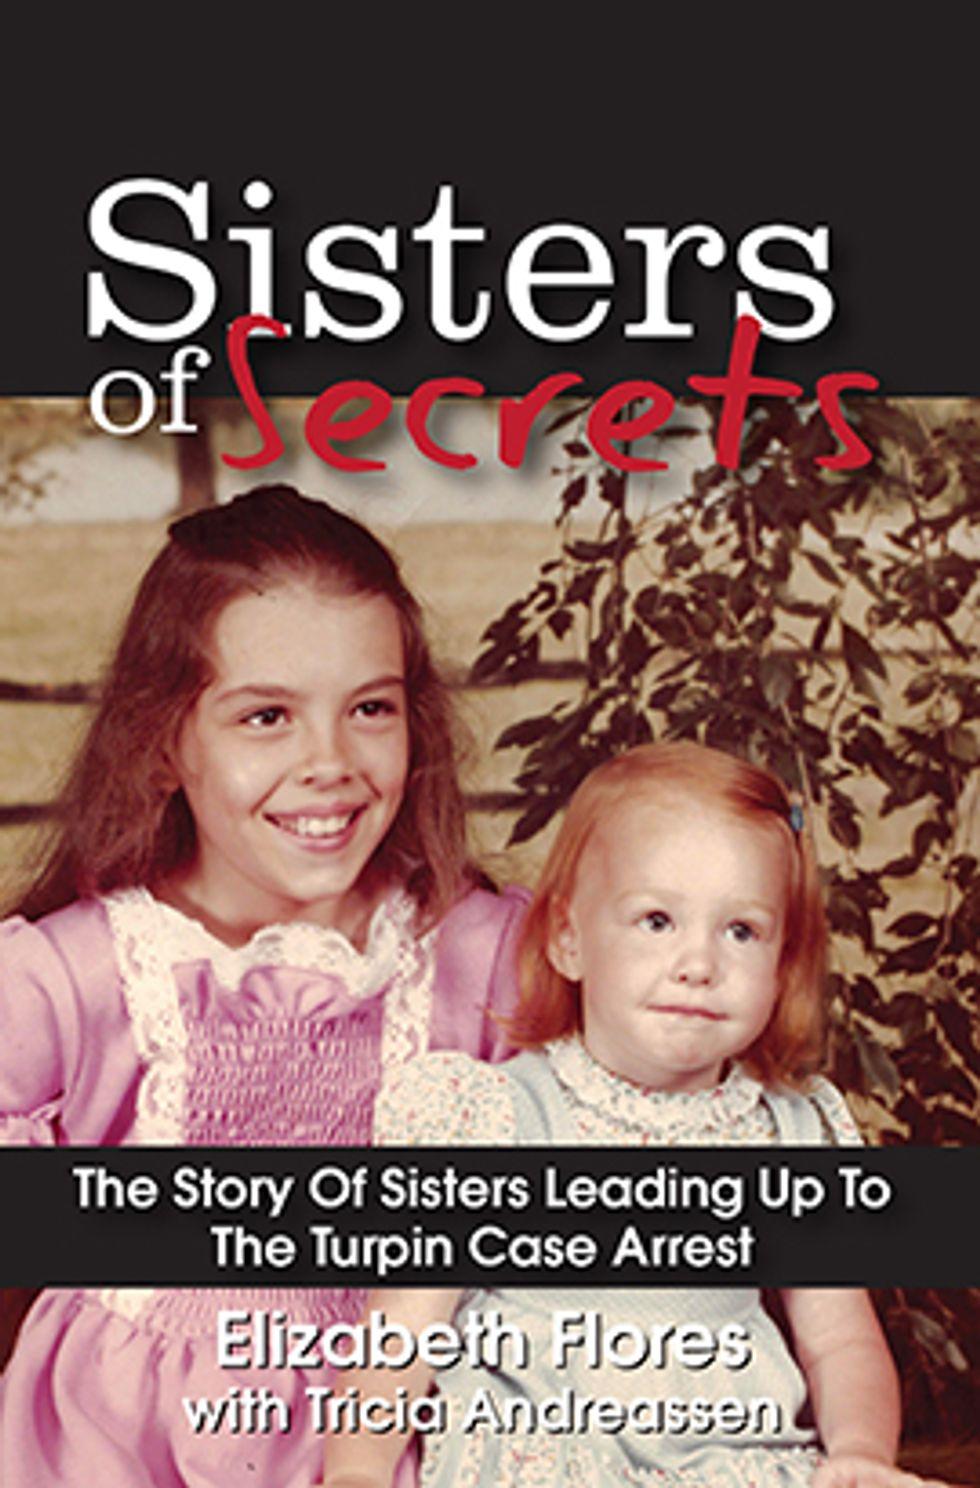 Sisters of Secrets